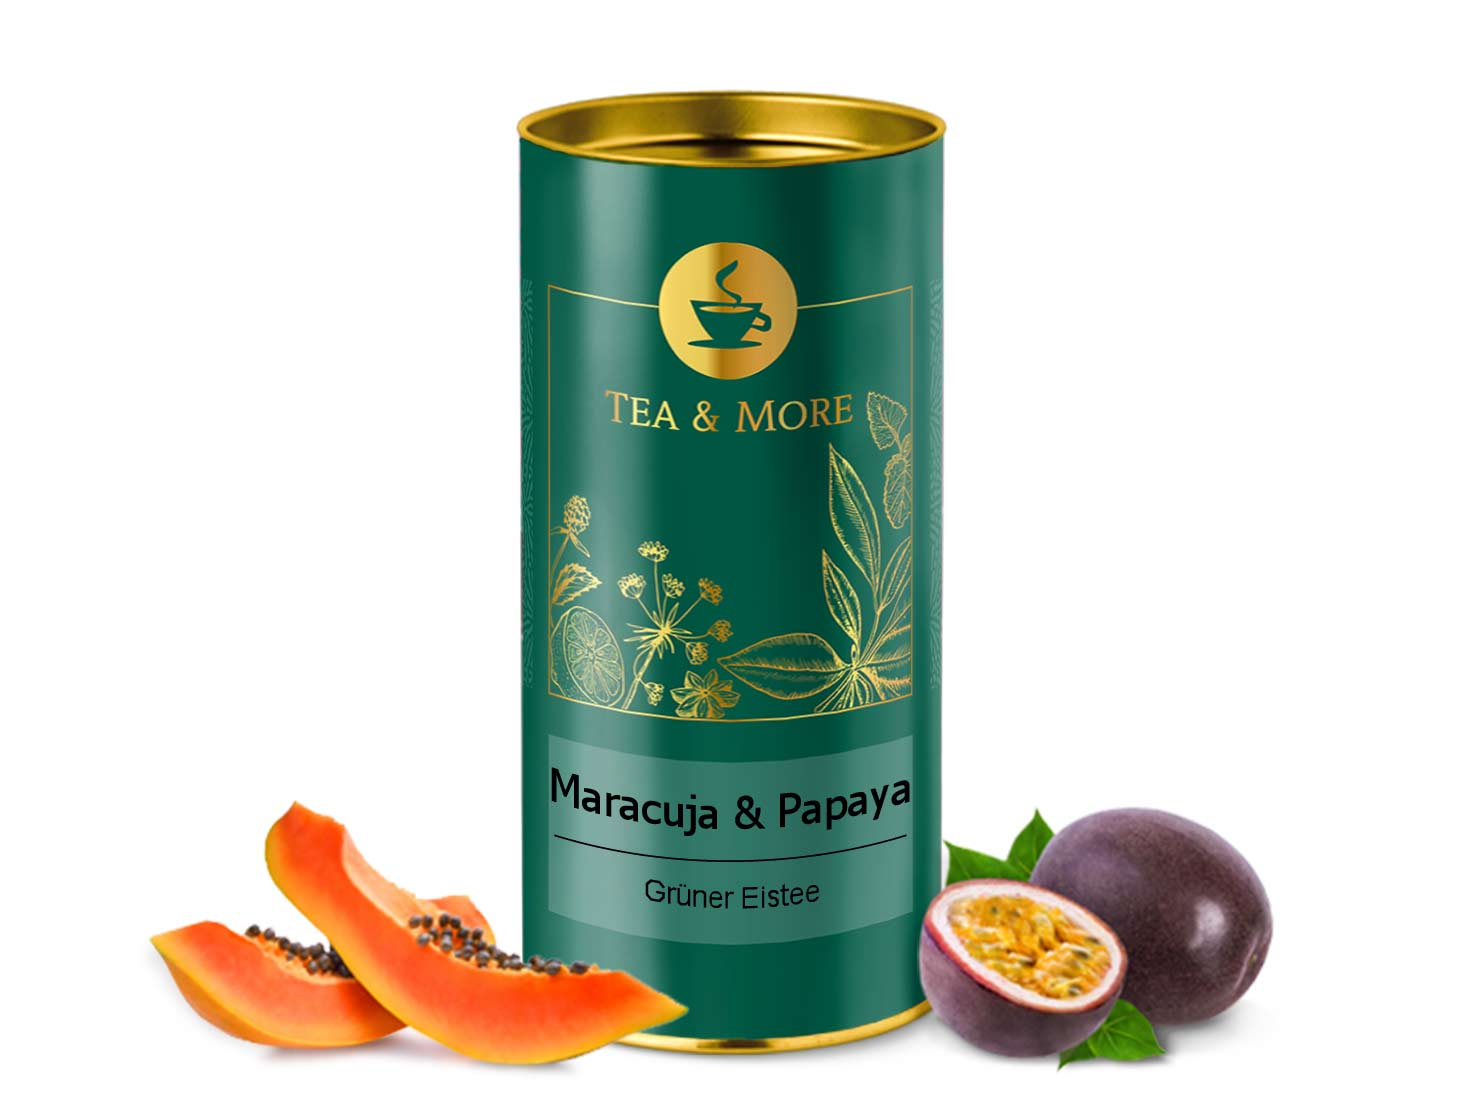 Maracuja & Papaya